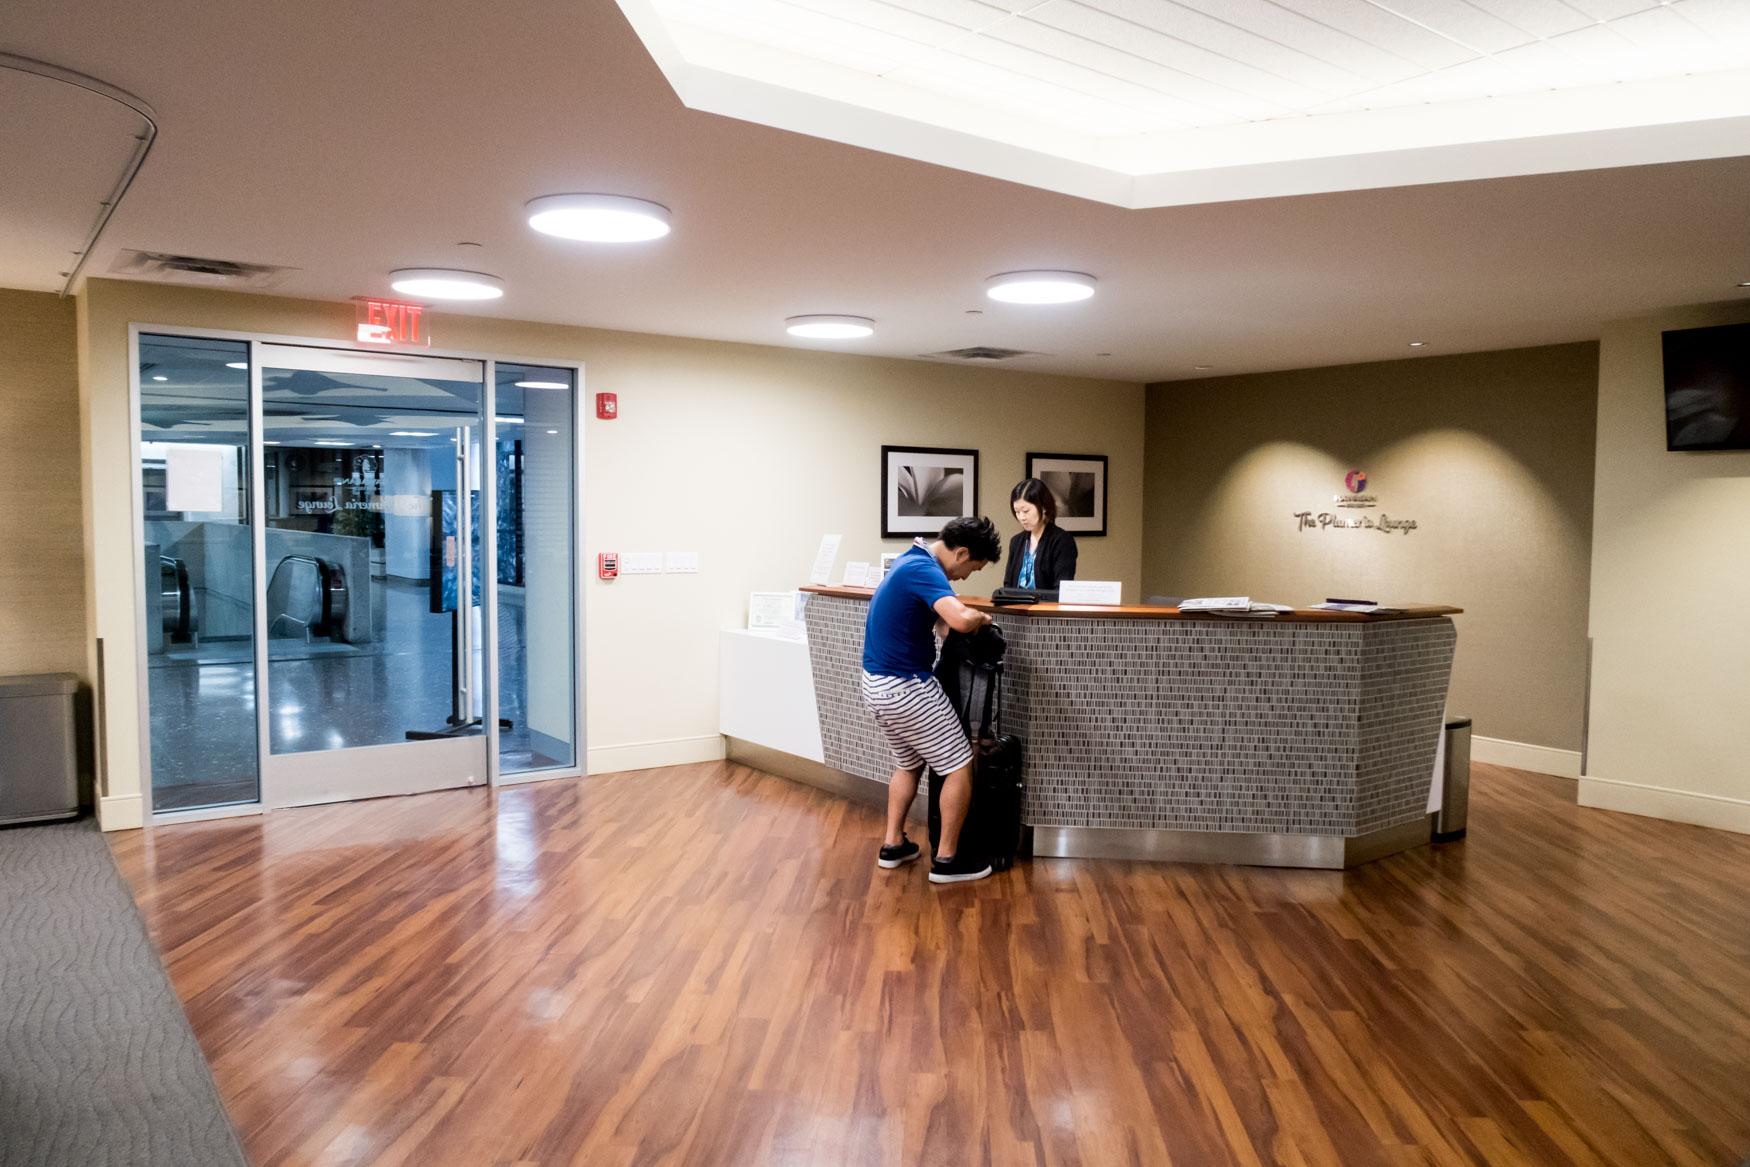 The Plumeria Lounge Reception